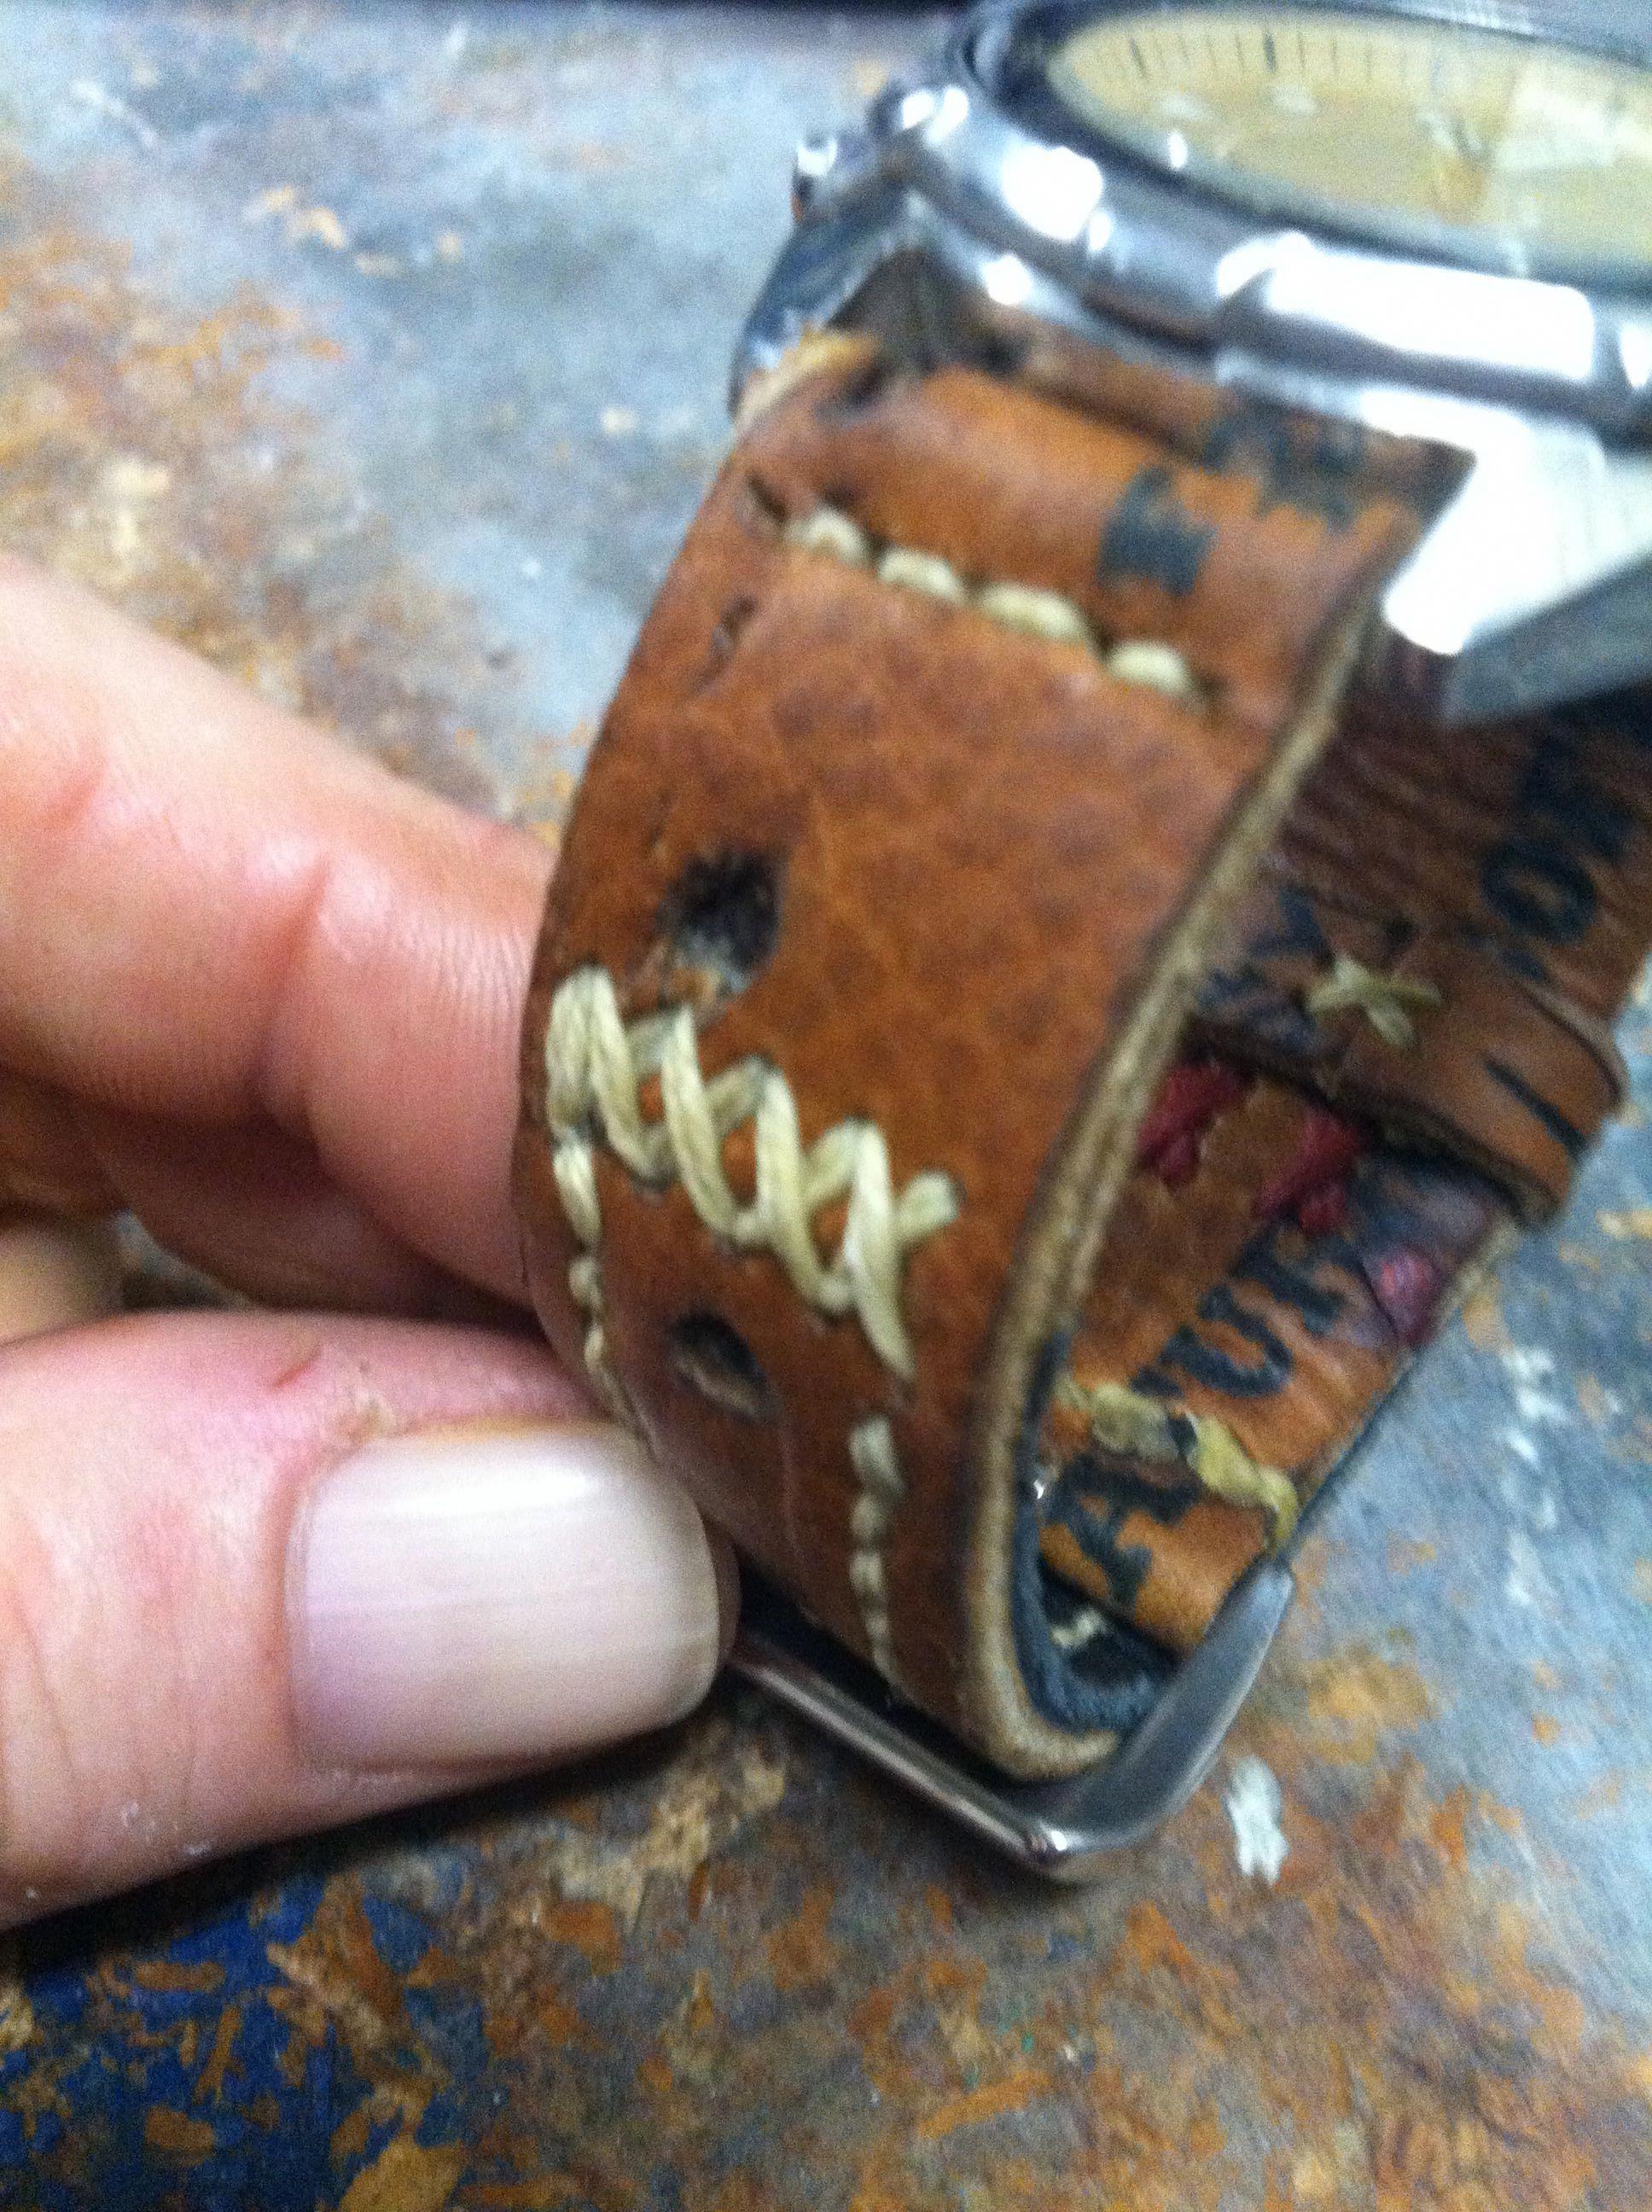 Repurposed Baseball Glove Into A Watchband Baseballgloves Watch Bands Repurposed Baseball Glove